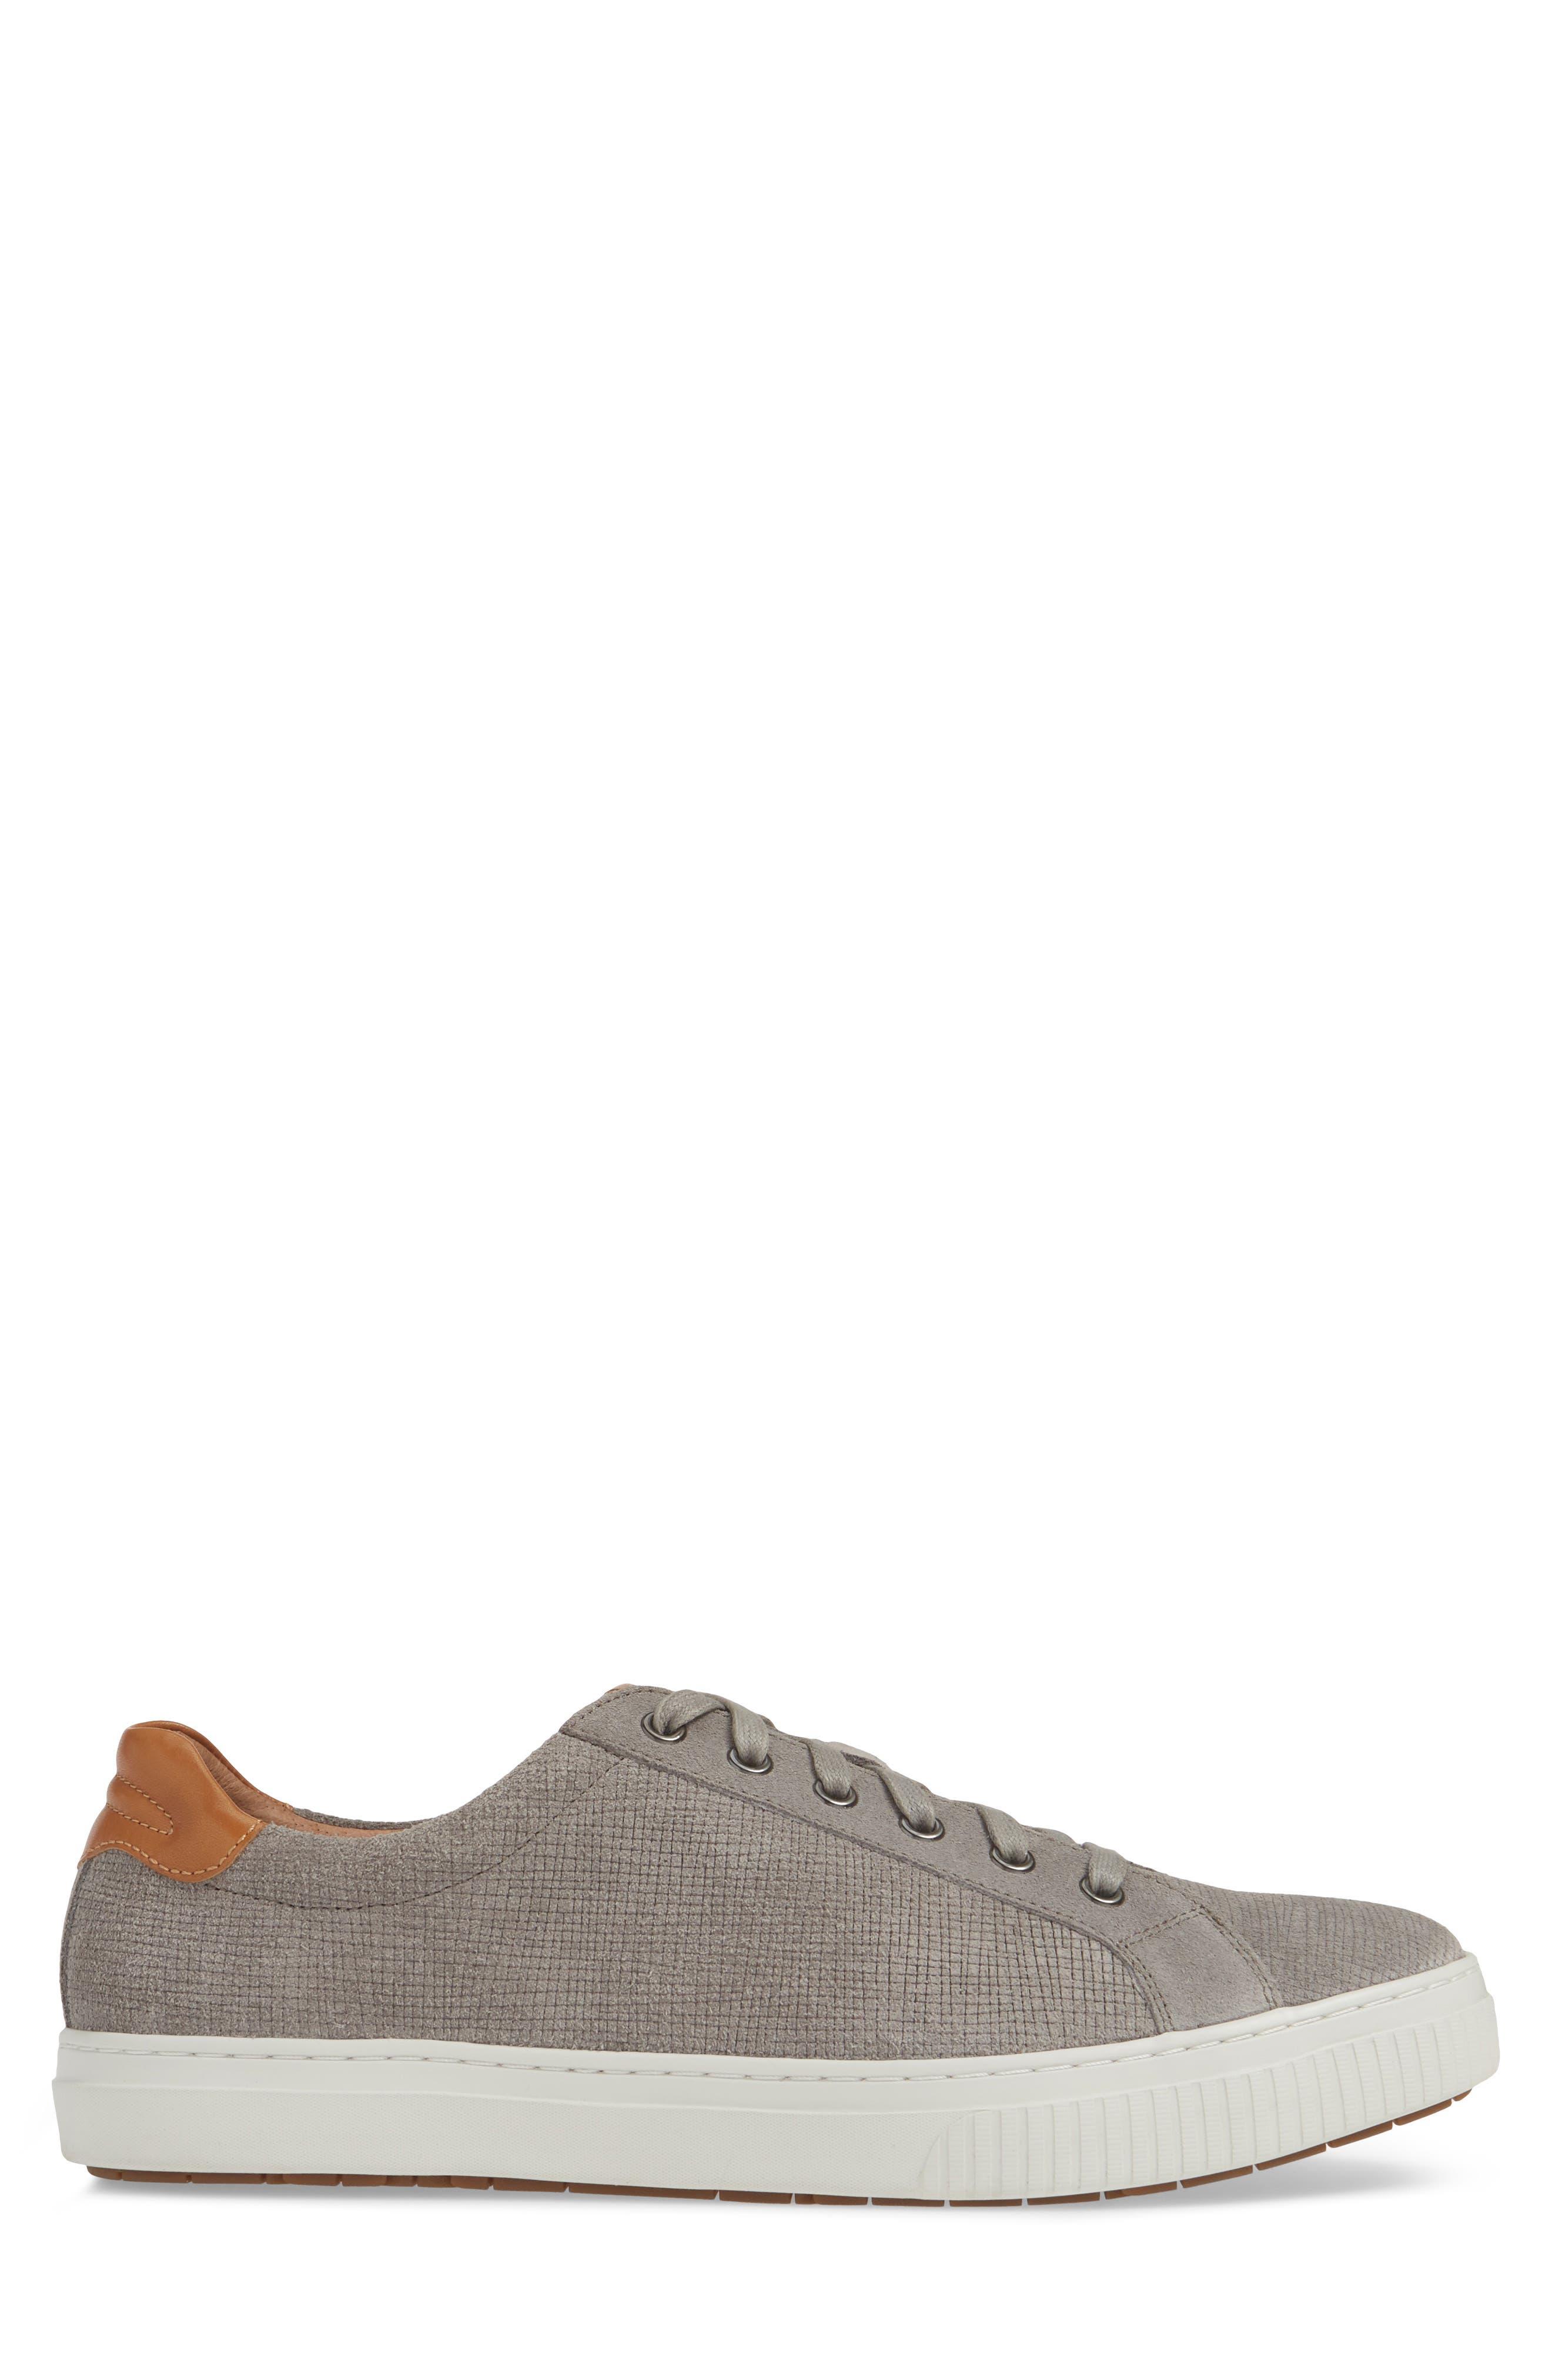 J&M 1850, Toliver Low Top Sneaker, Alternate thumbnail 3, color, GREY SUEDE